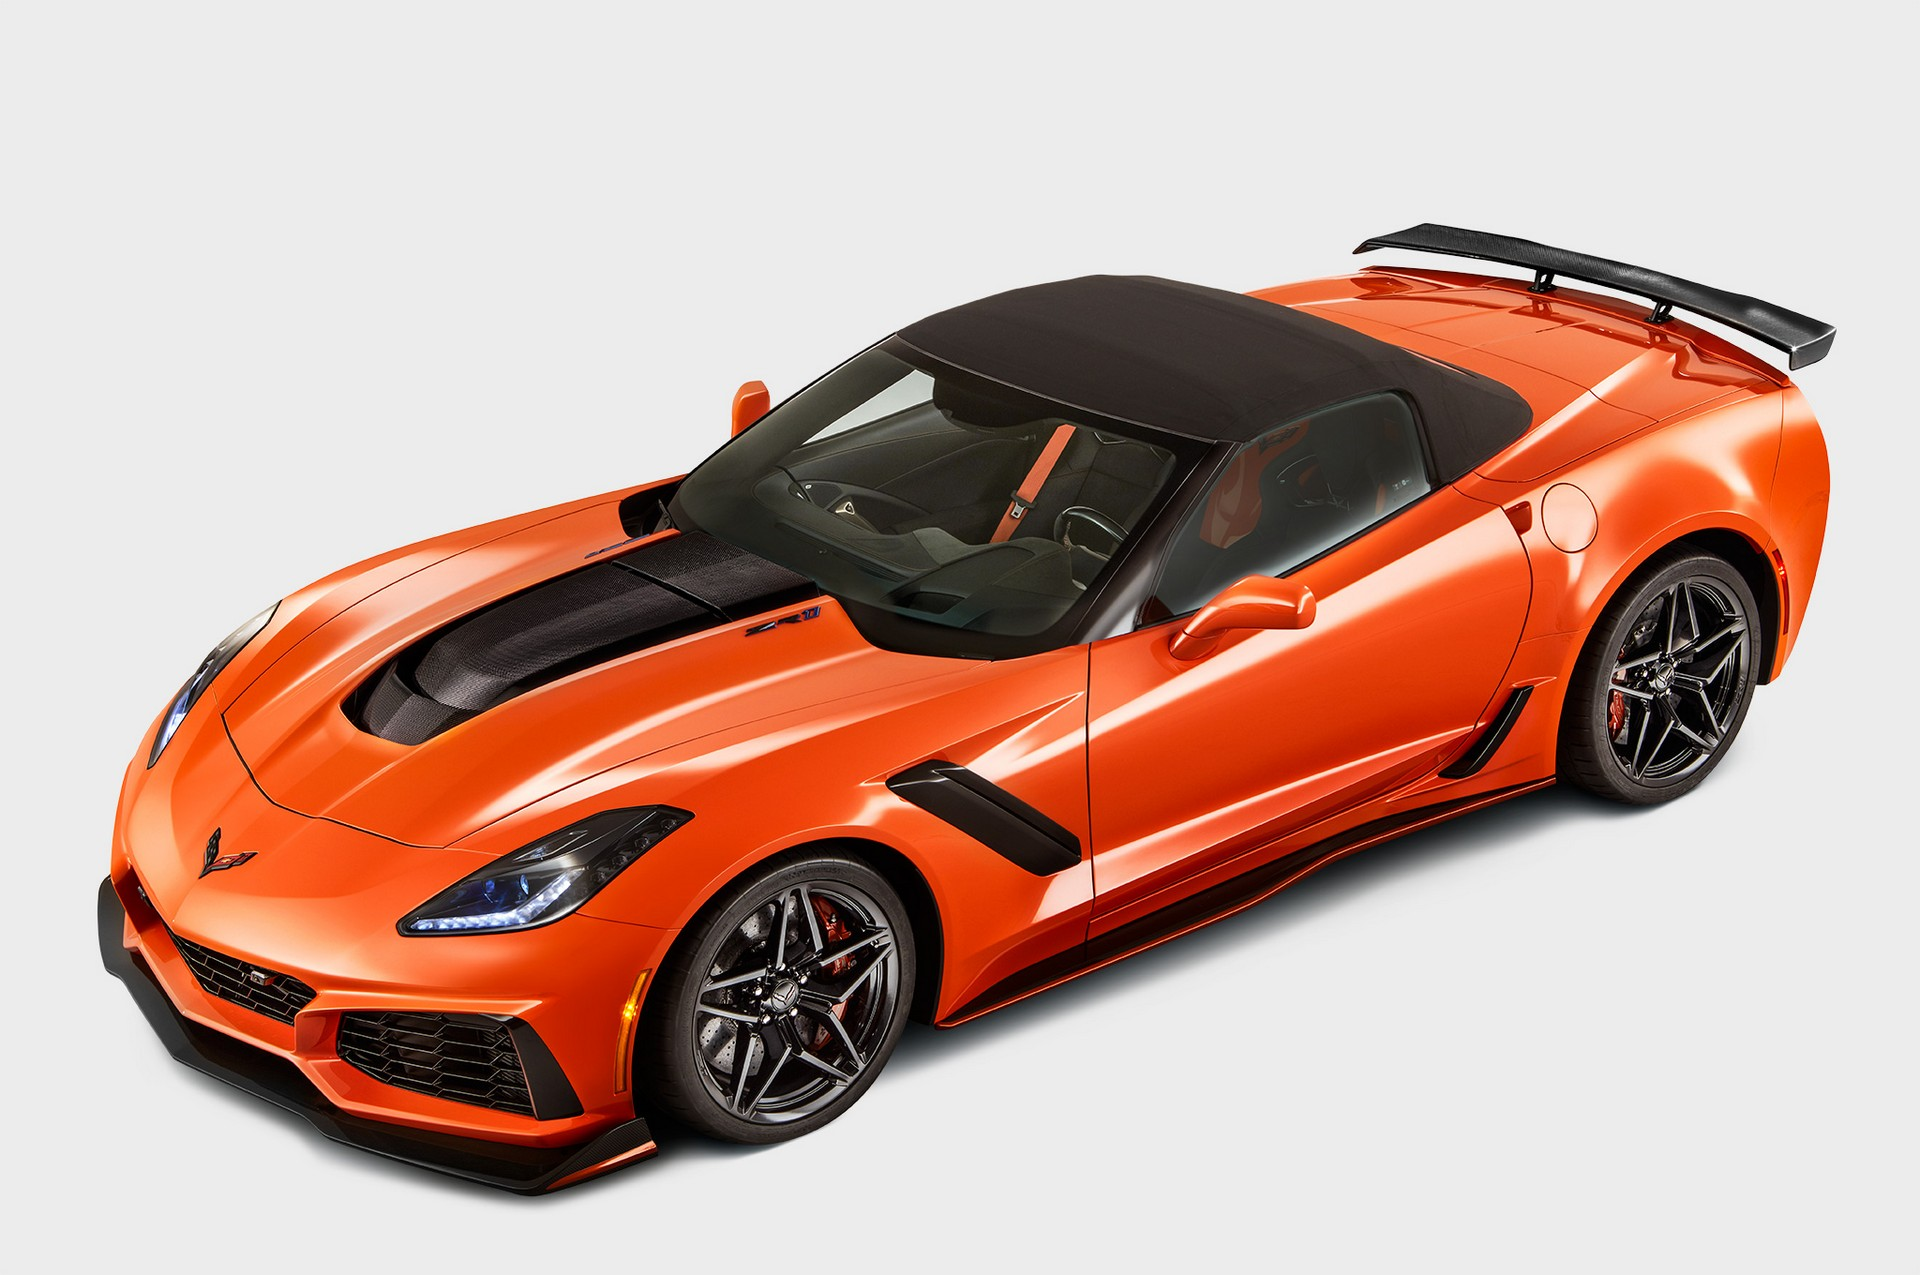 chevrolet corvette zr1 convertible 2018. Black Bedroom Furniture Sets. Home Design Ideas